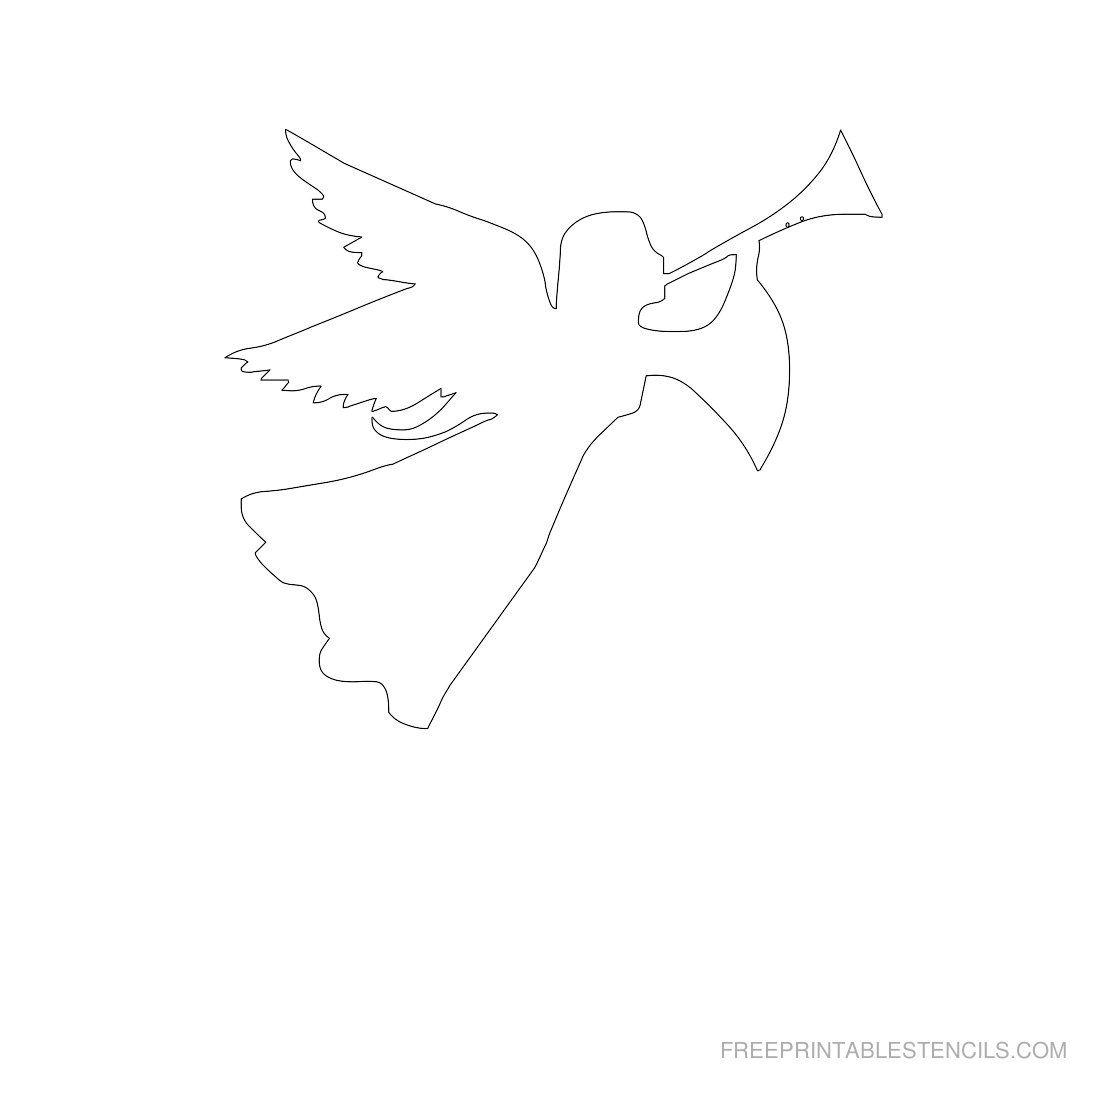 Http Freeprintablestencils Com Freestencils Printable Angels